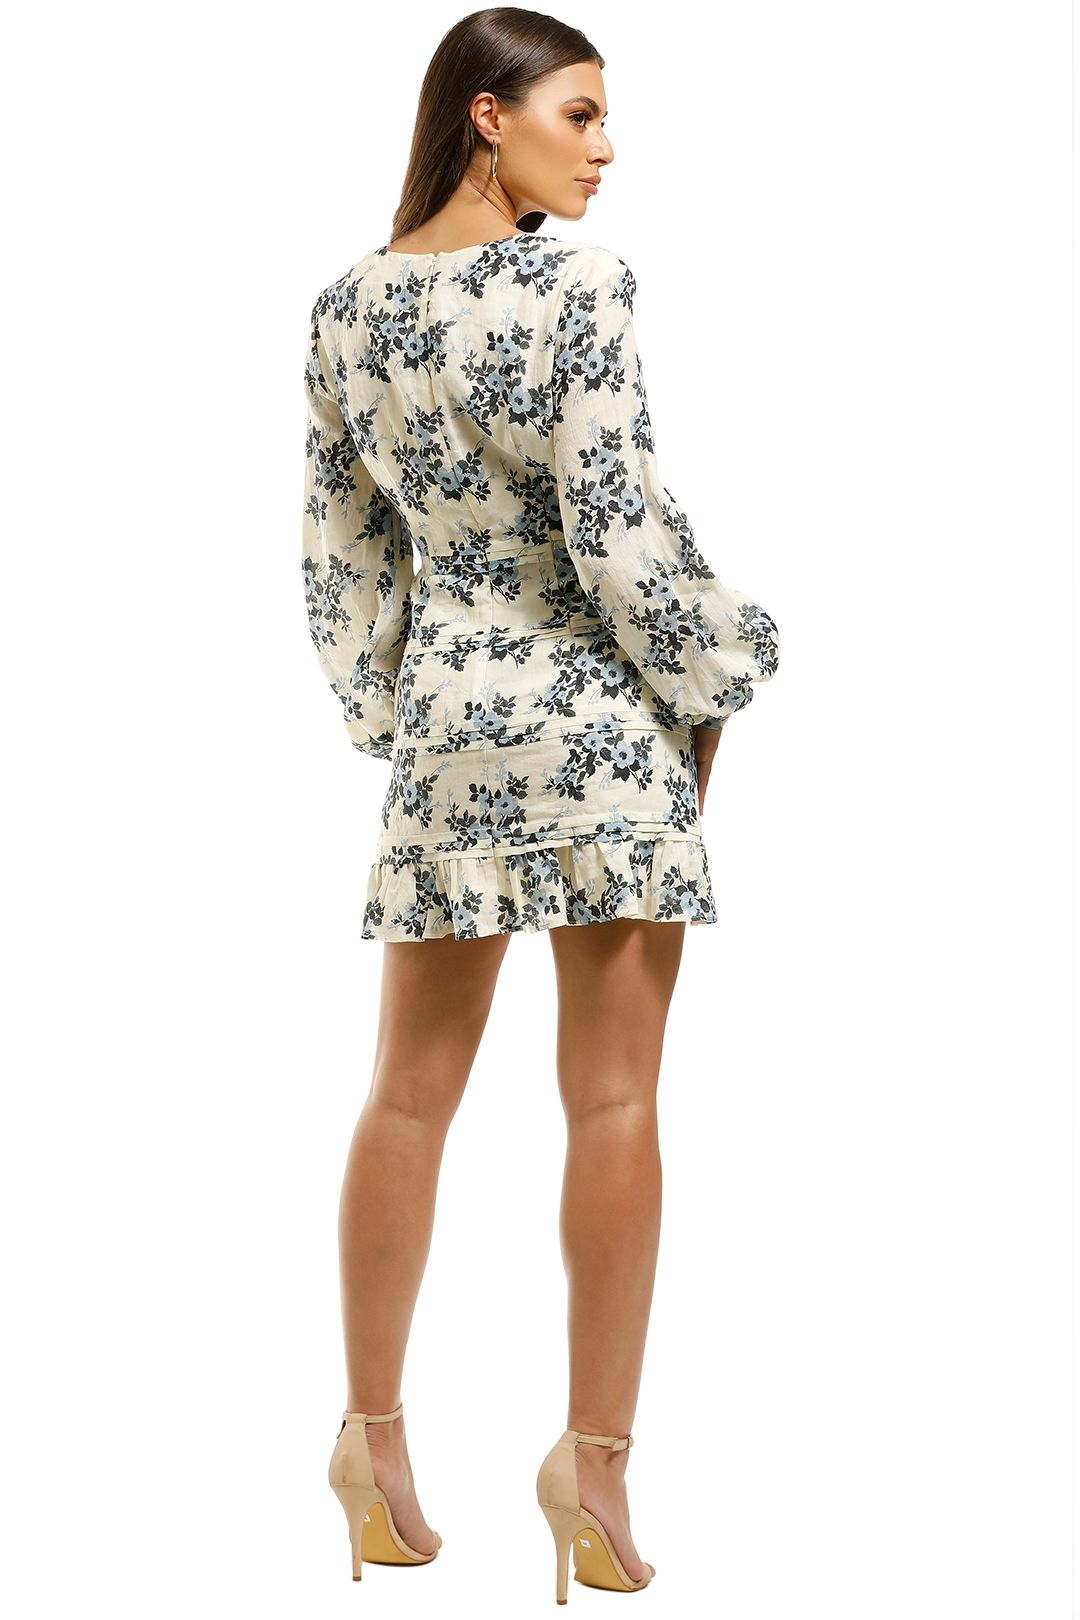 Talulah-Blue-Belle-Mini-Dress-Floral-Back